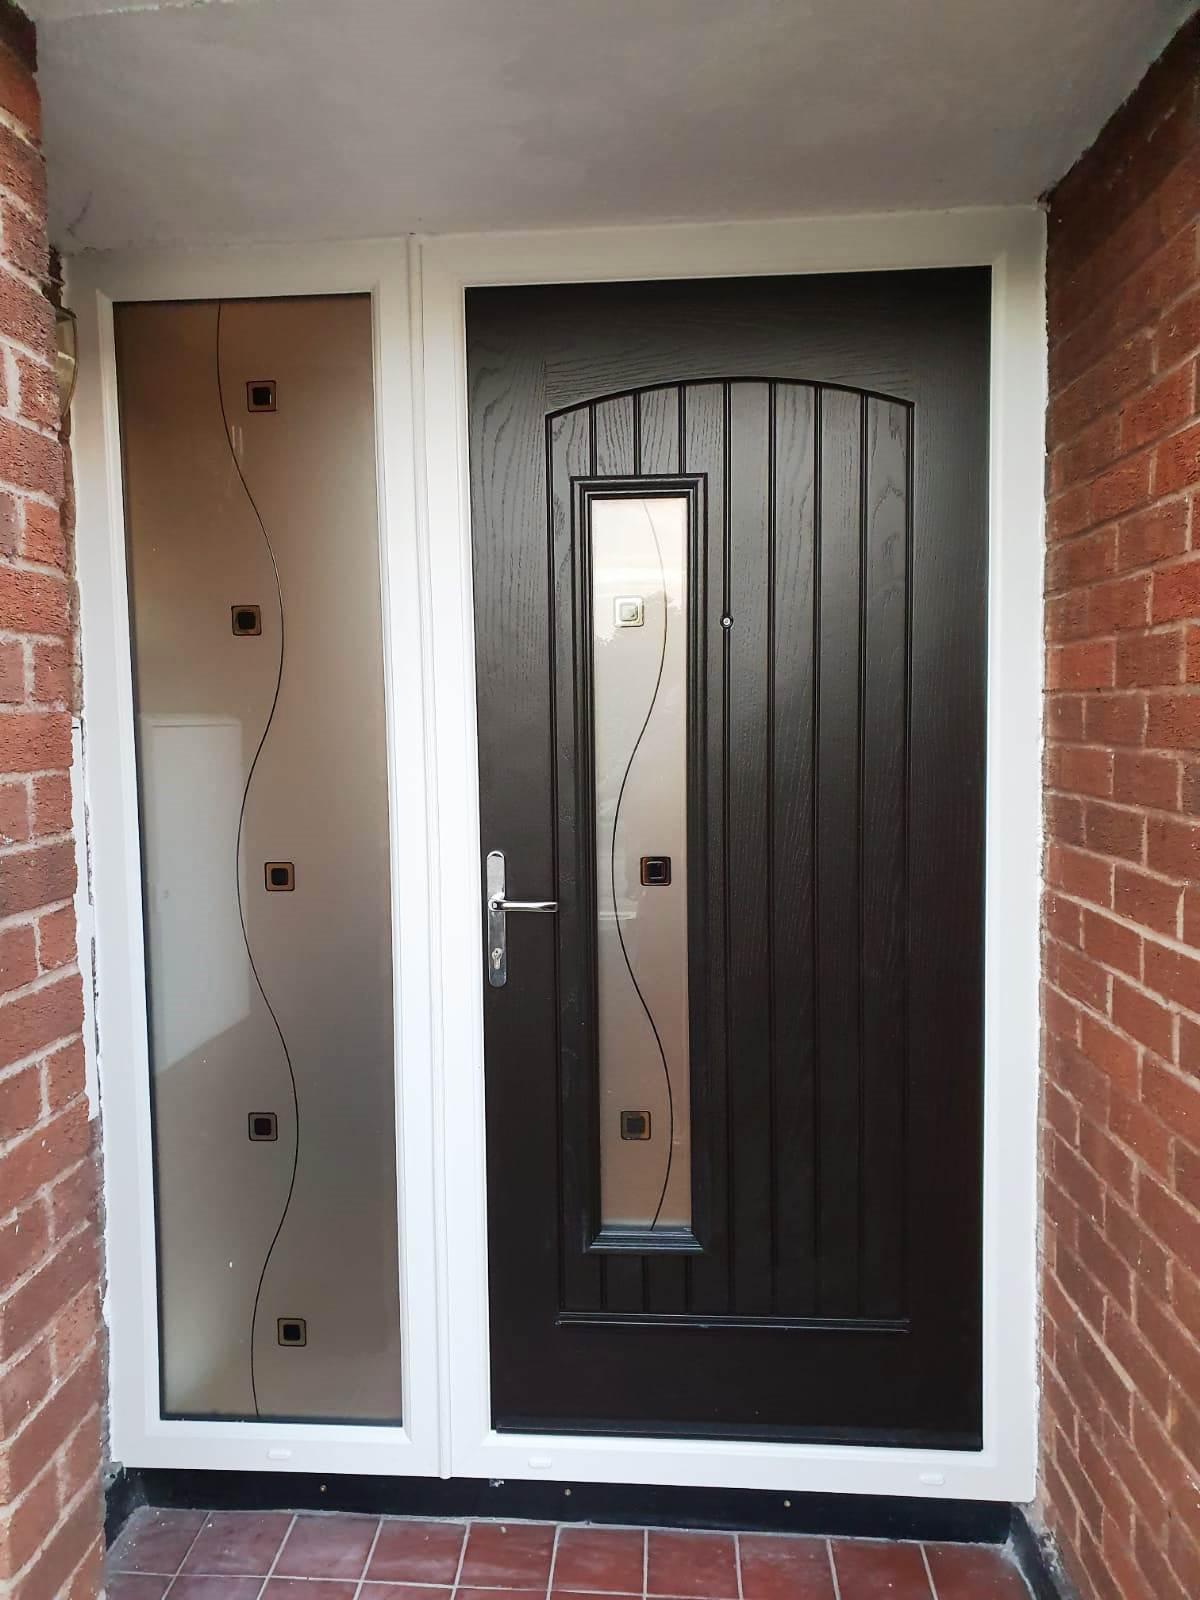 Palladio composite Front rome door in bog oak colour  door and white colour frame